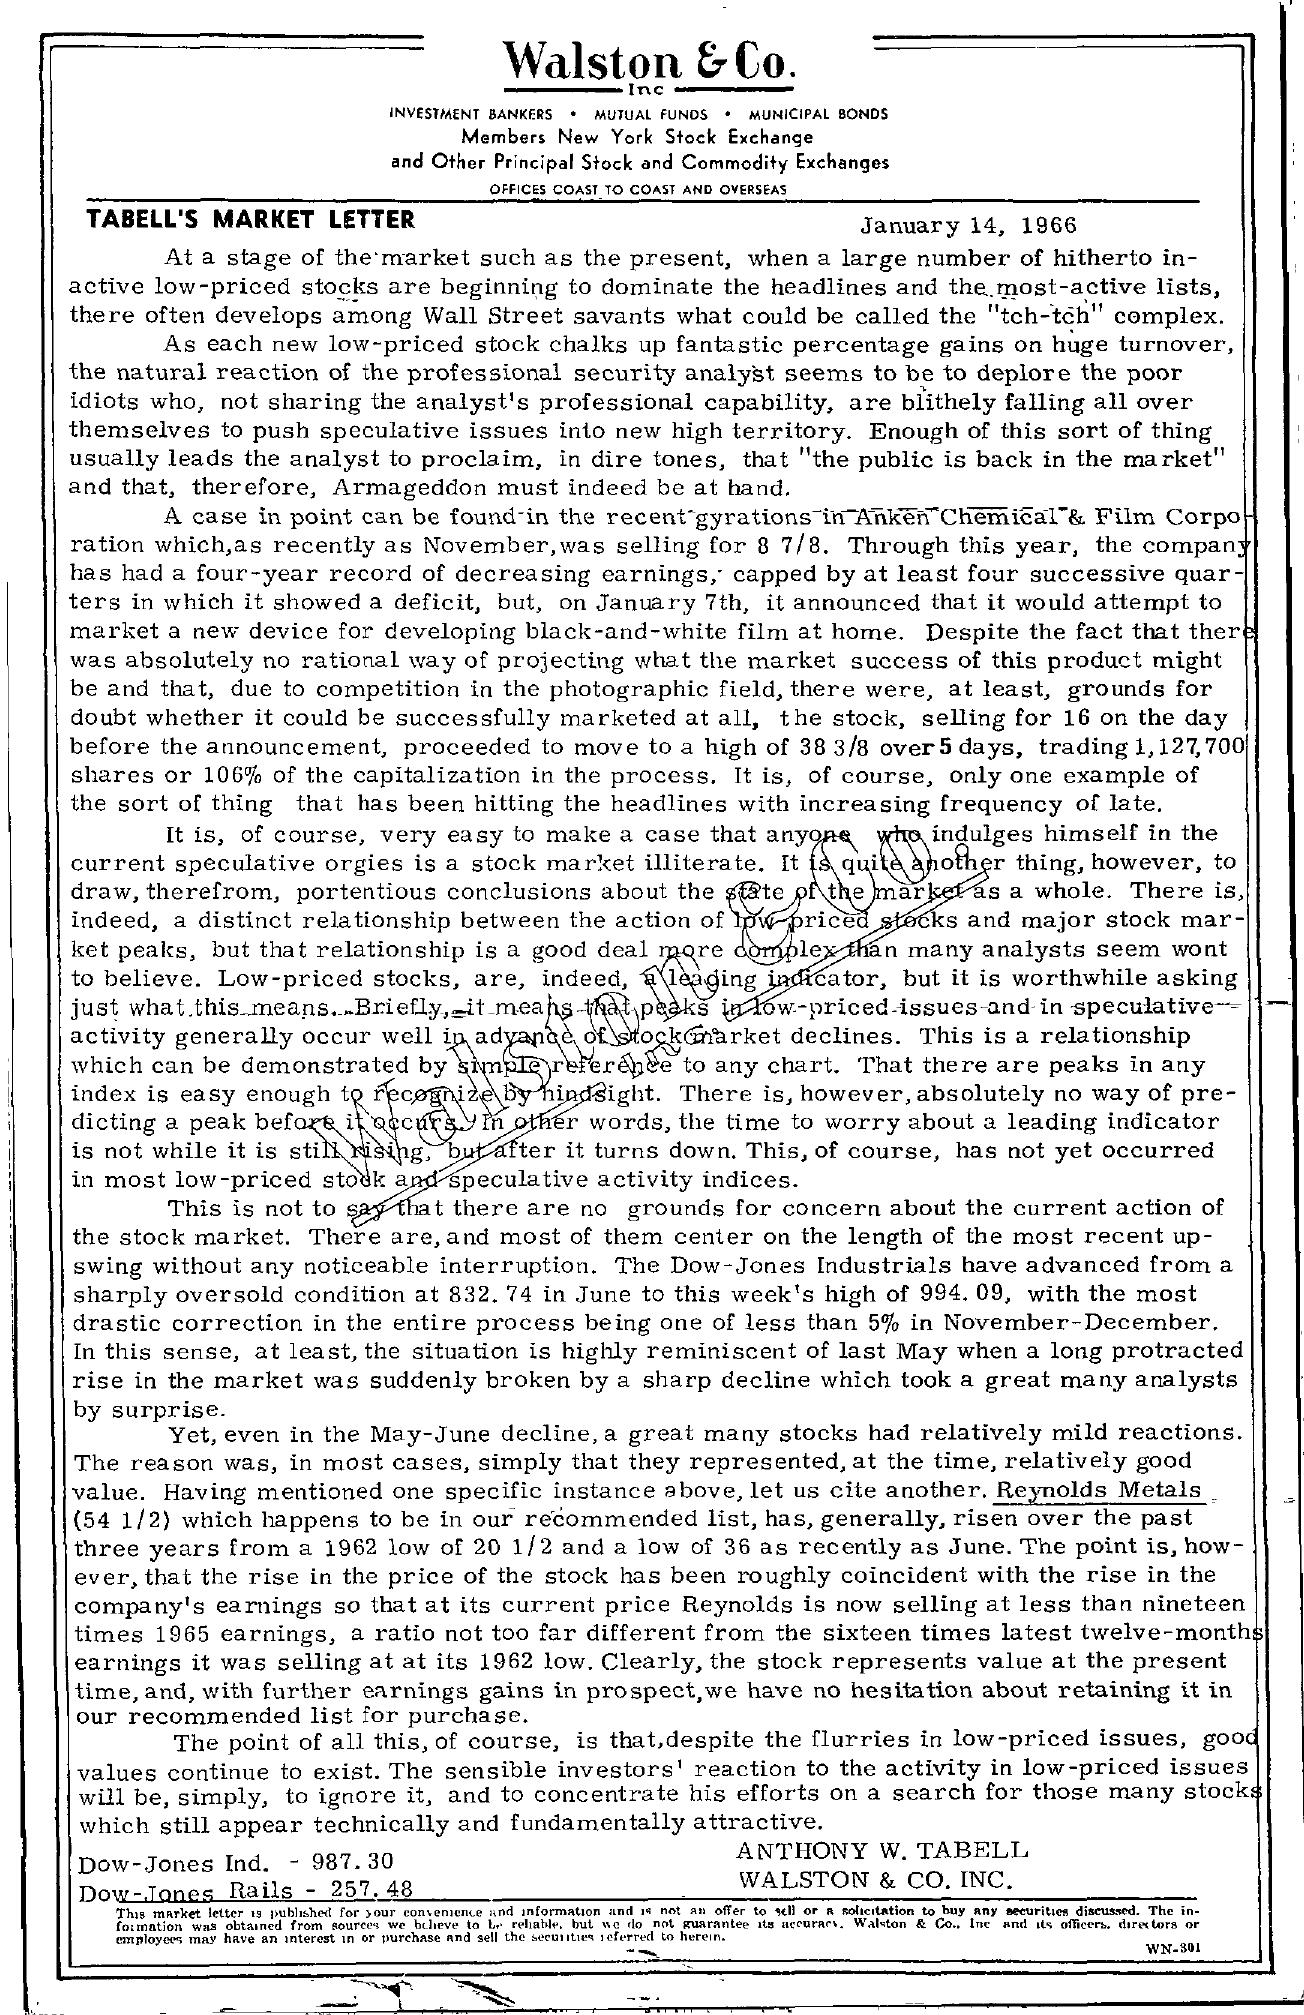 Tabell's Market Letter - January 14, 1966